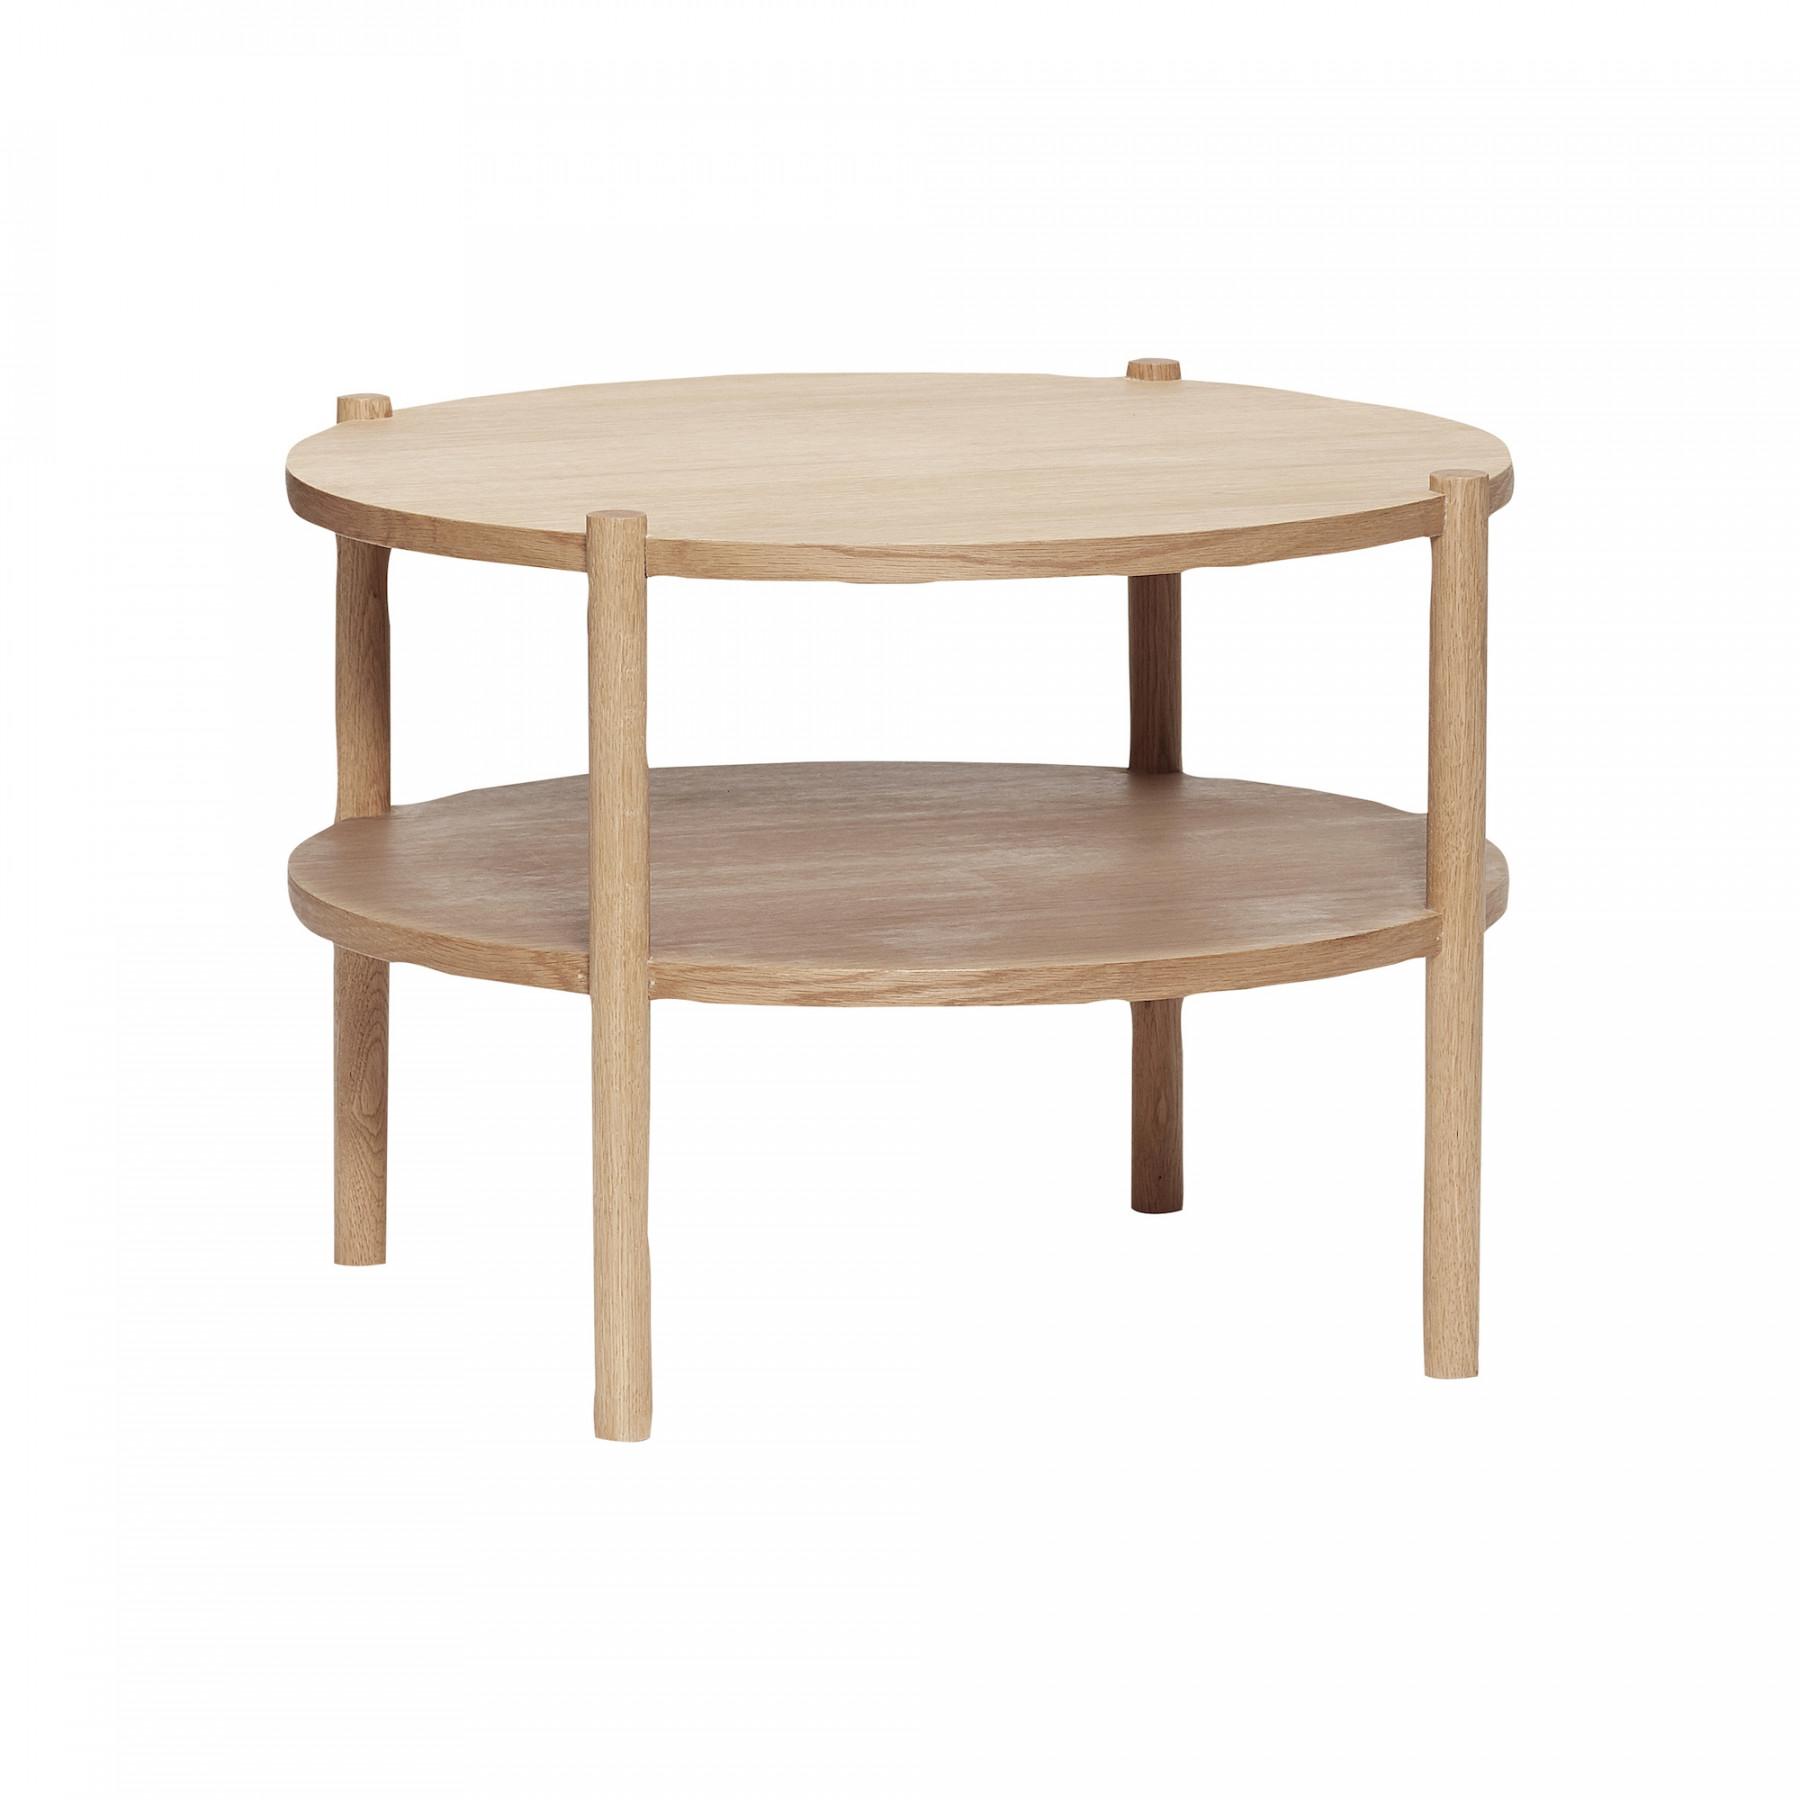 Rundt sofabord i egetræ med hylde fra Hübsch.